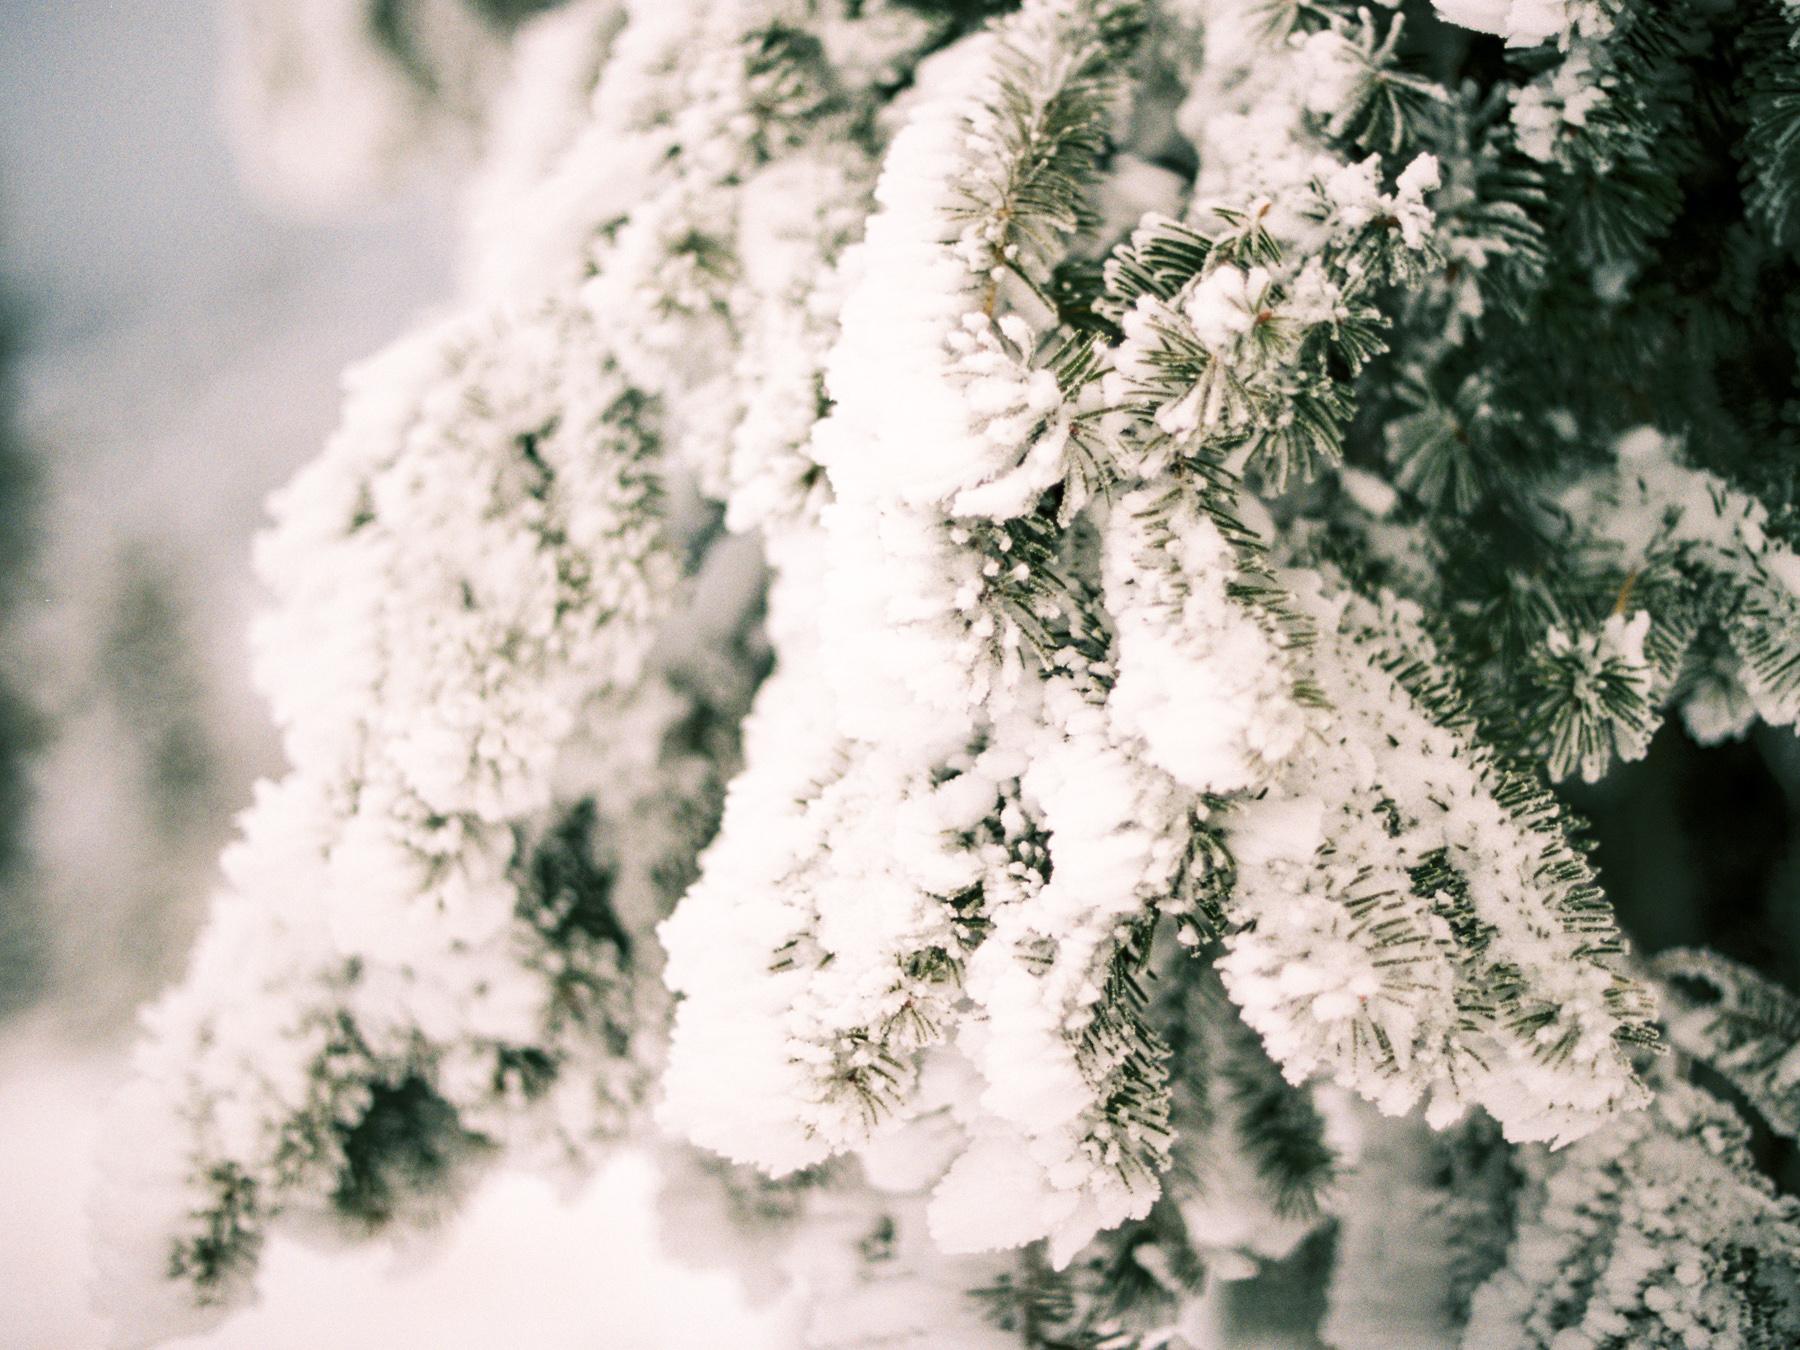 Ben+Joella | Winter on Film 16.jpg